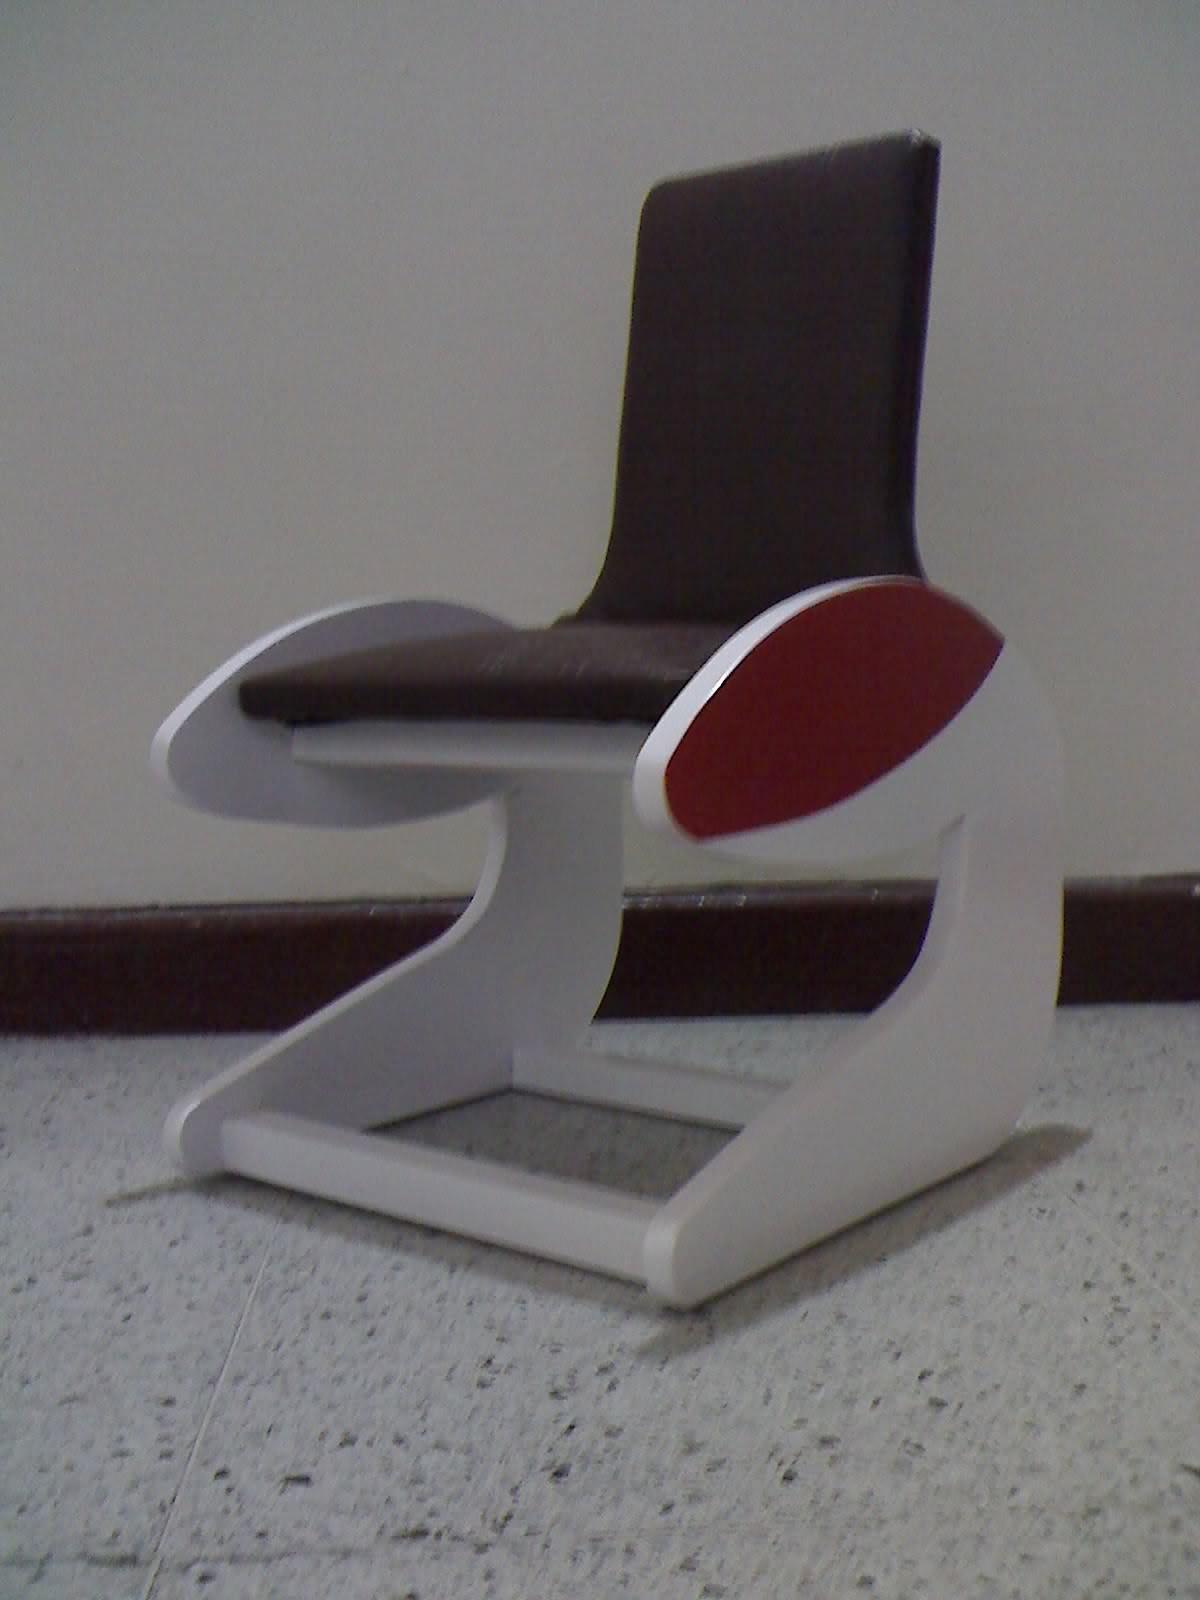 Dise o industrial prototipo silla for Sillas famosas diseno industrial